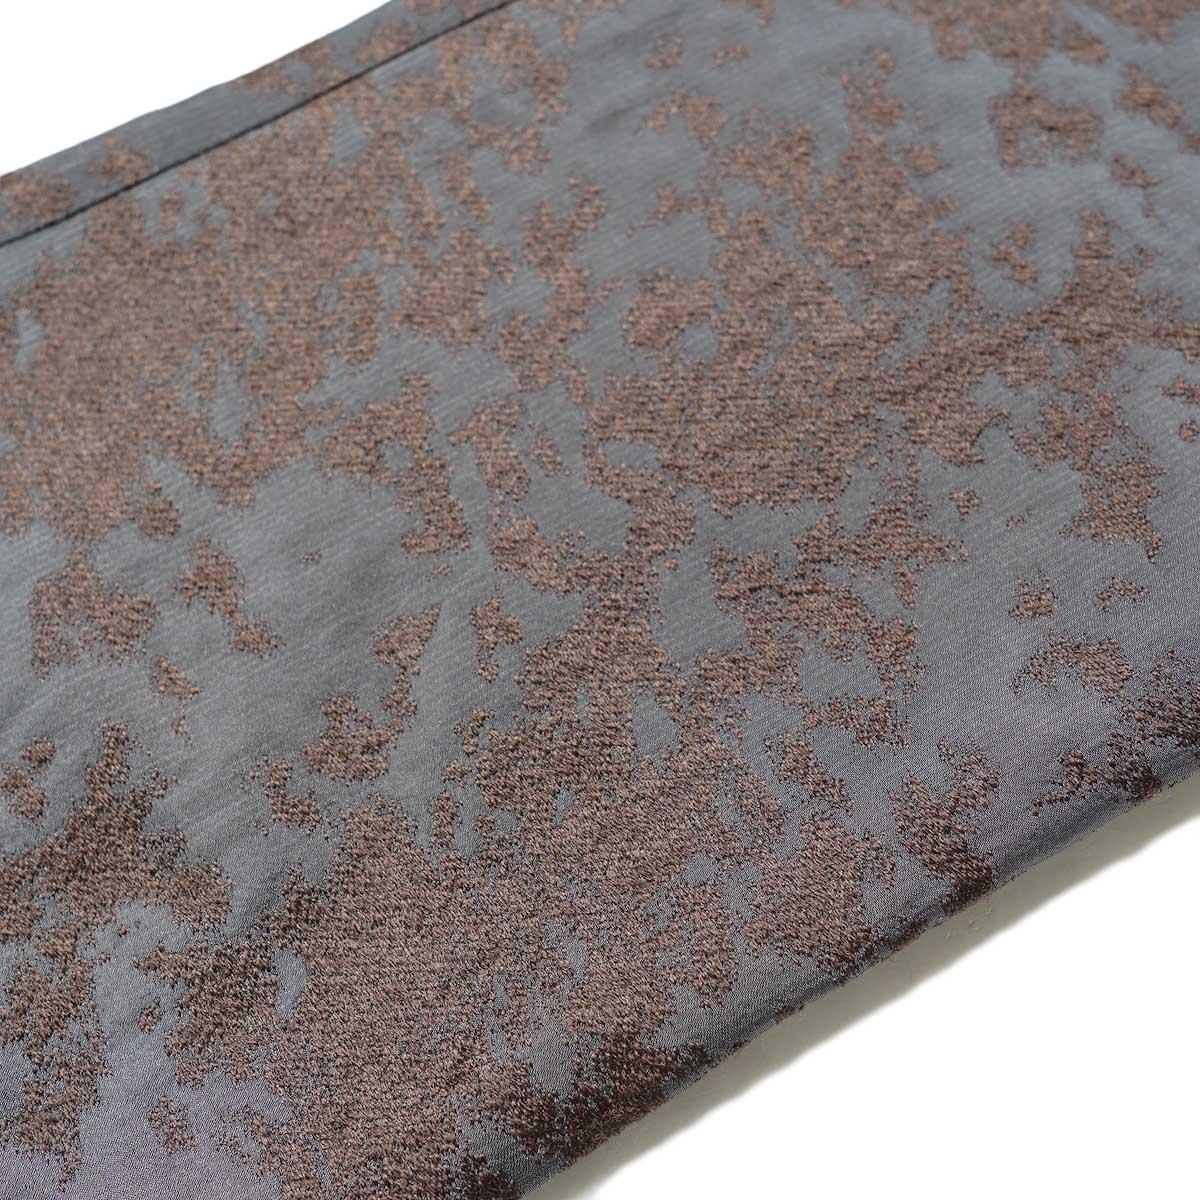 Needles / W.U. BOOT CUT PANT (Brown) 生地アップ